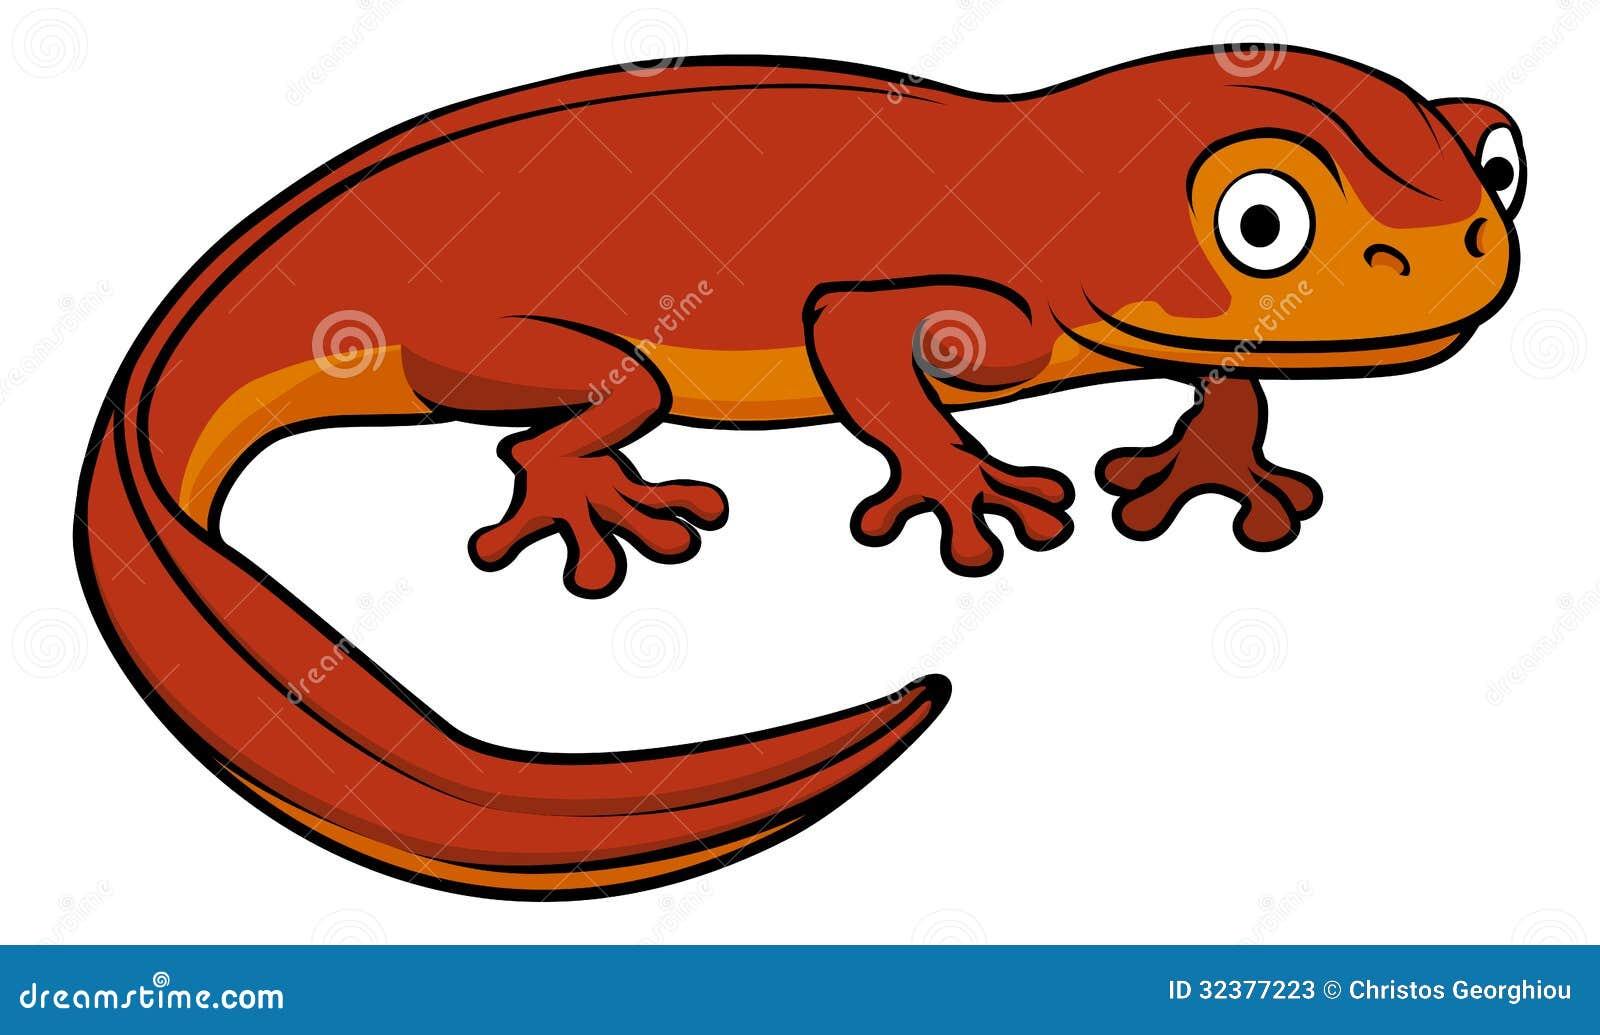 An illustration of a happy cute cartoon newt.